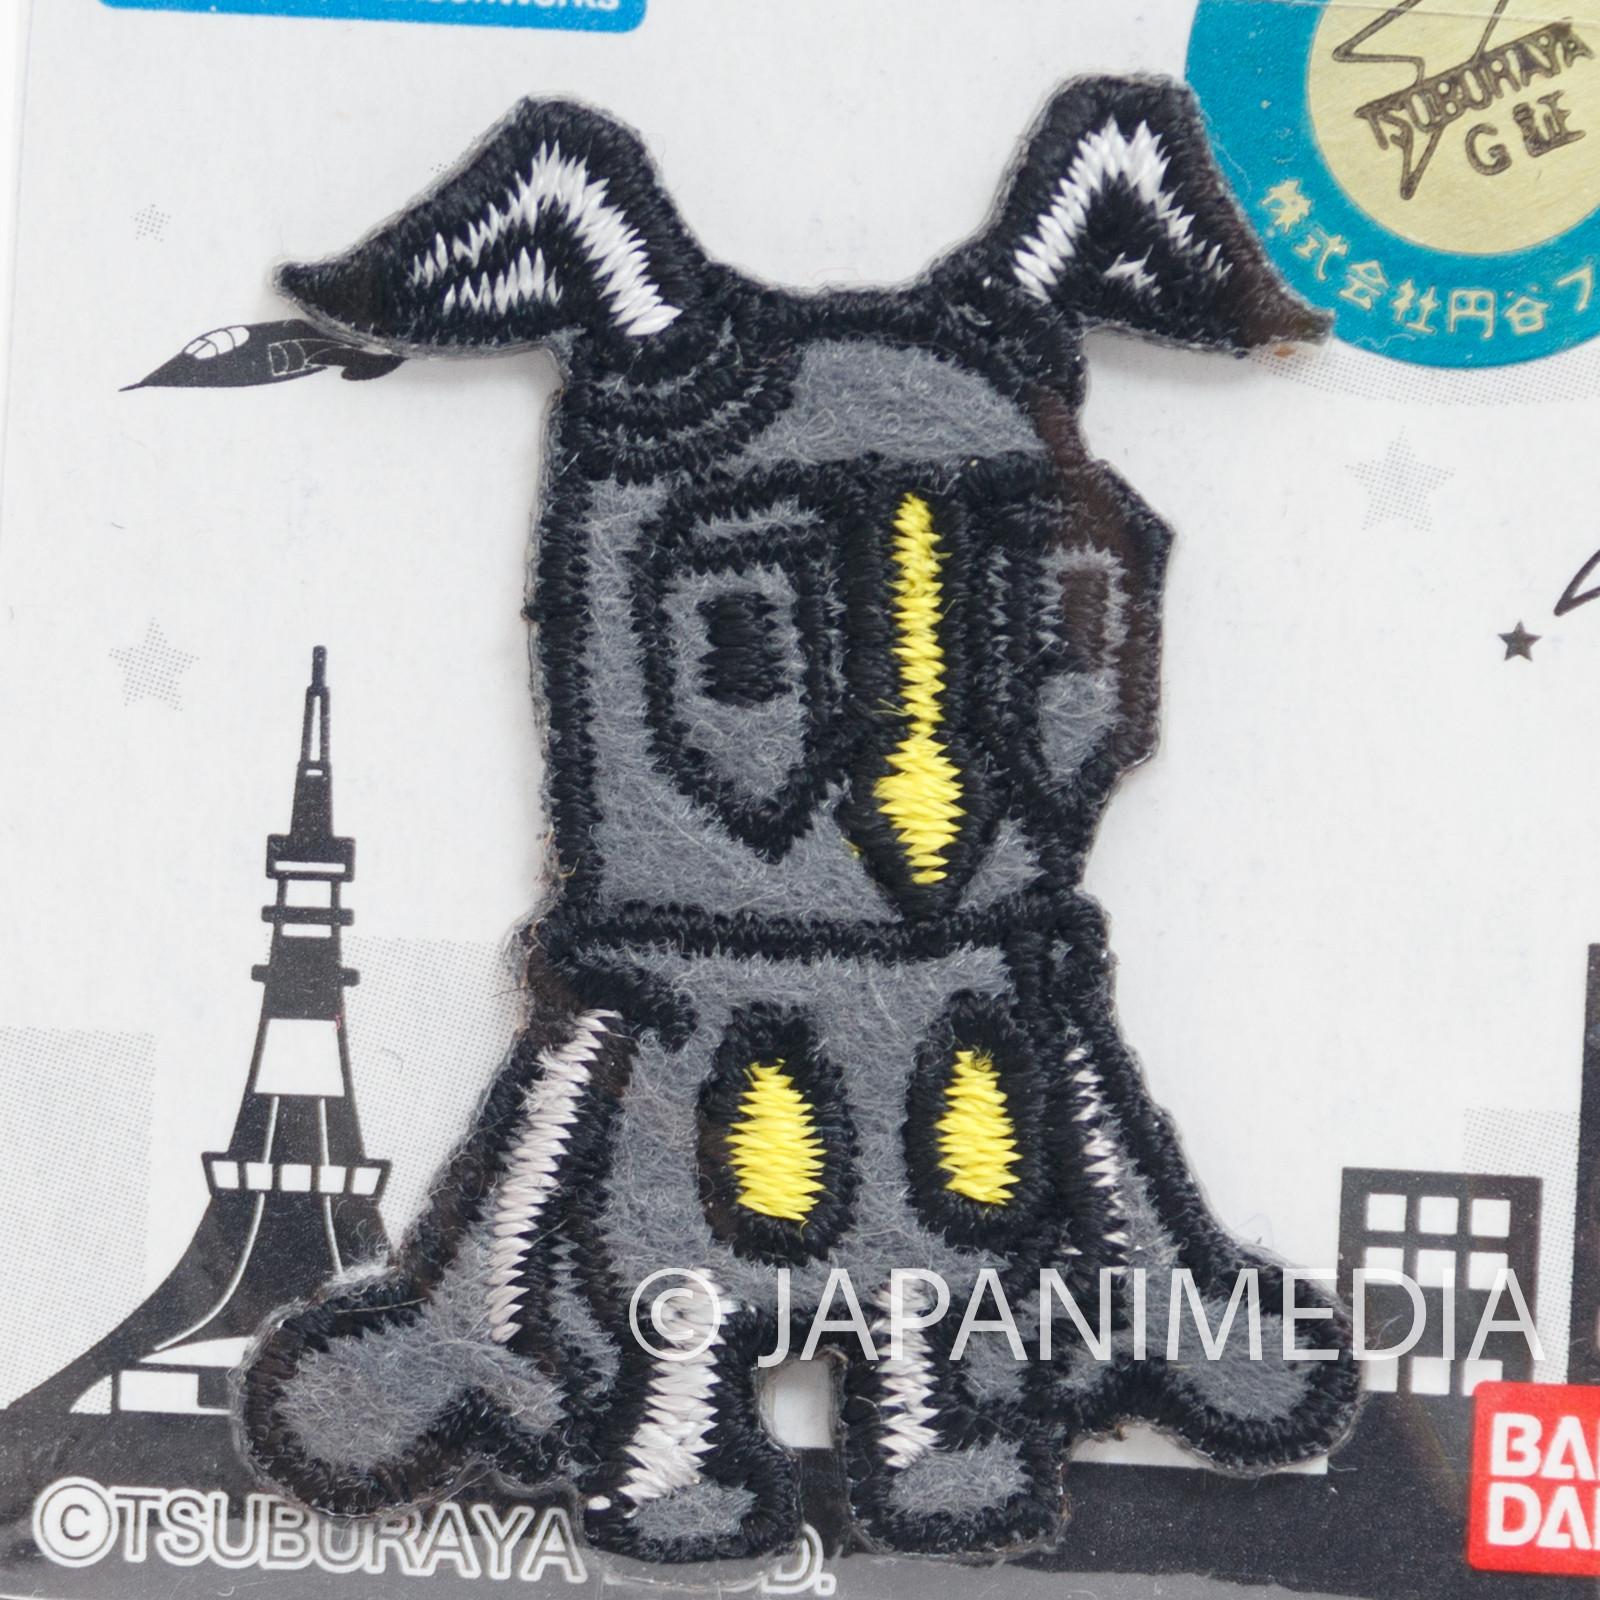 Ultraman Alien Z-Ton Zetton Wappen Emblem Badge BANDAI JAPAN